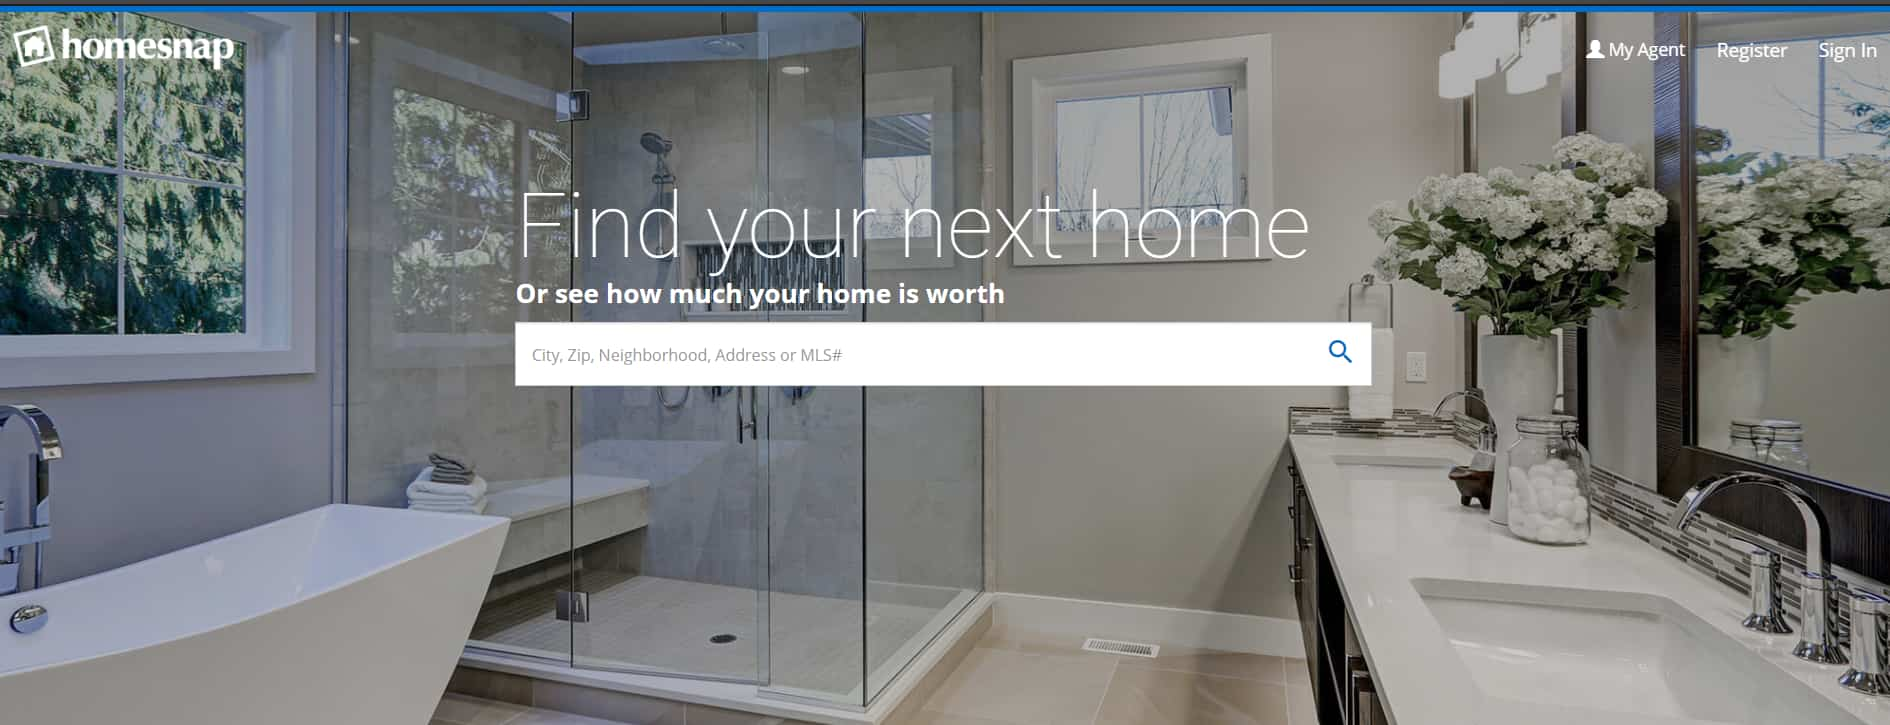 Homesnap website